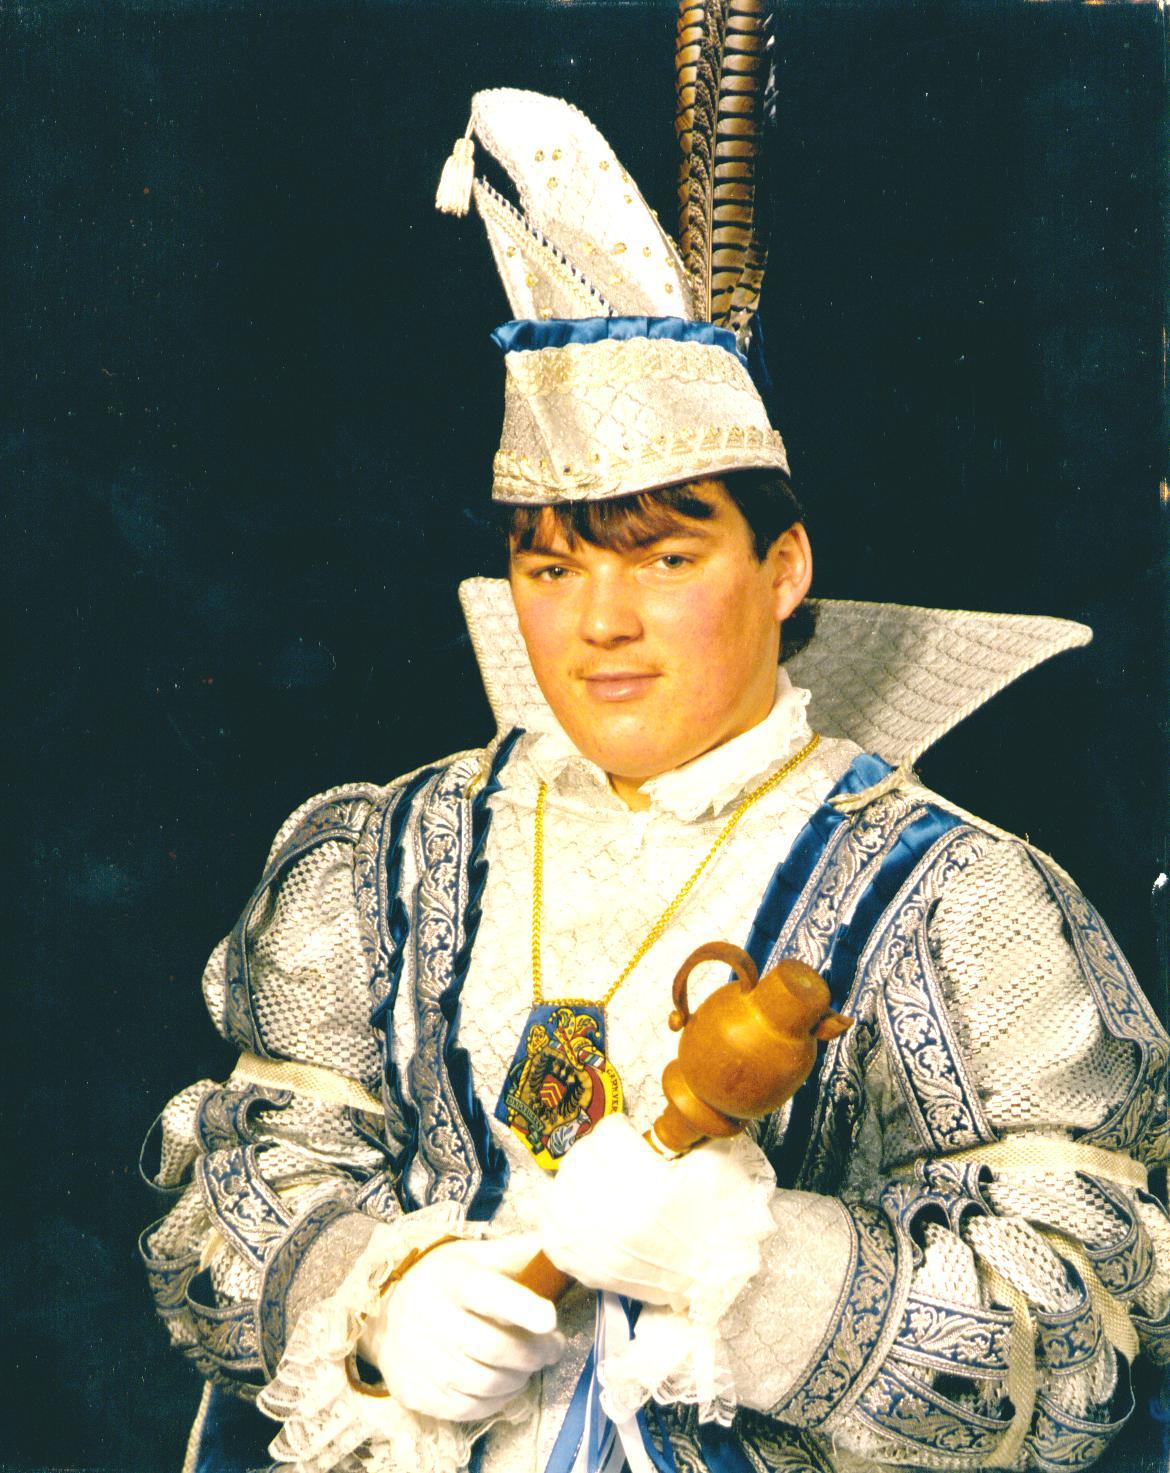 1984 Prins Ton (III) Heylighen